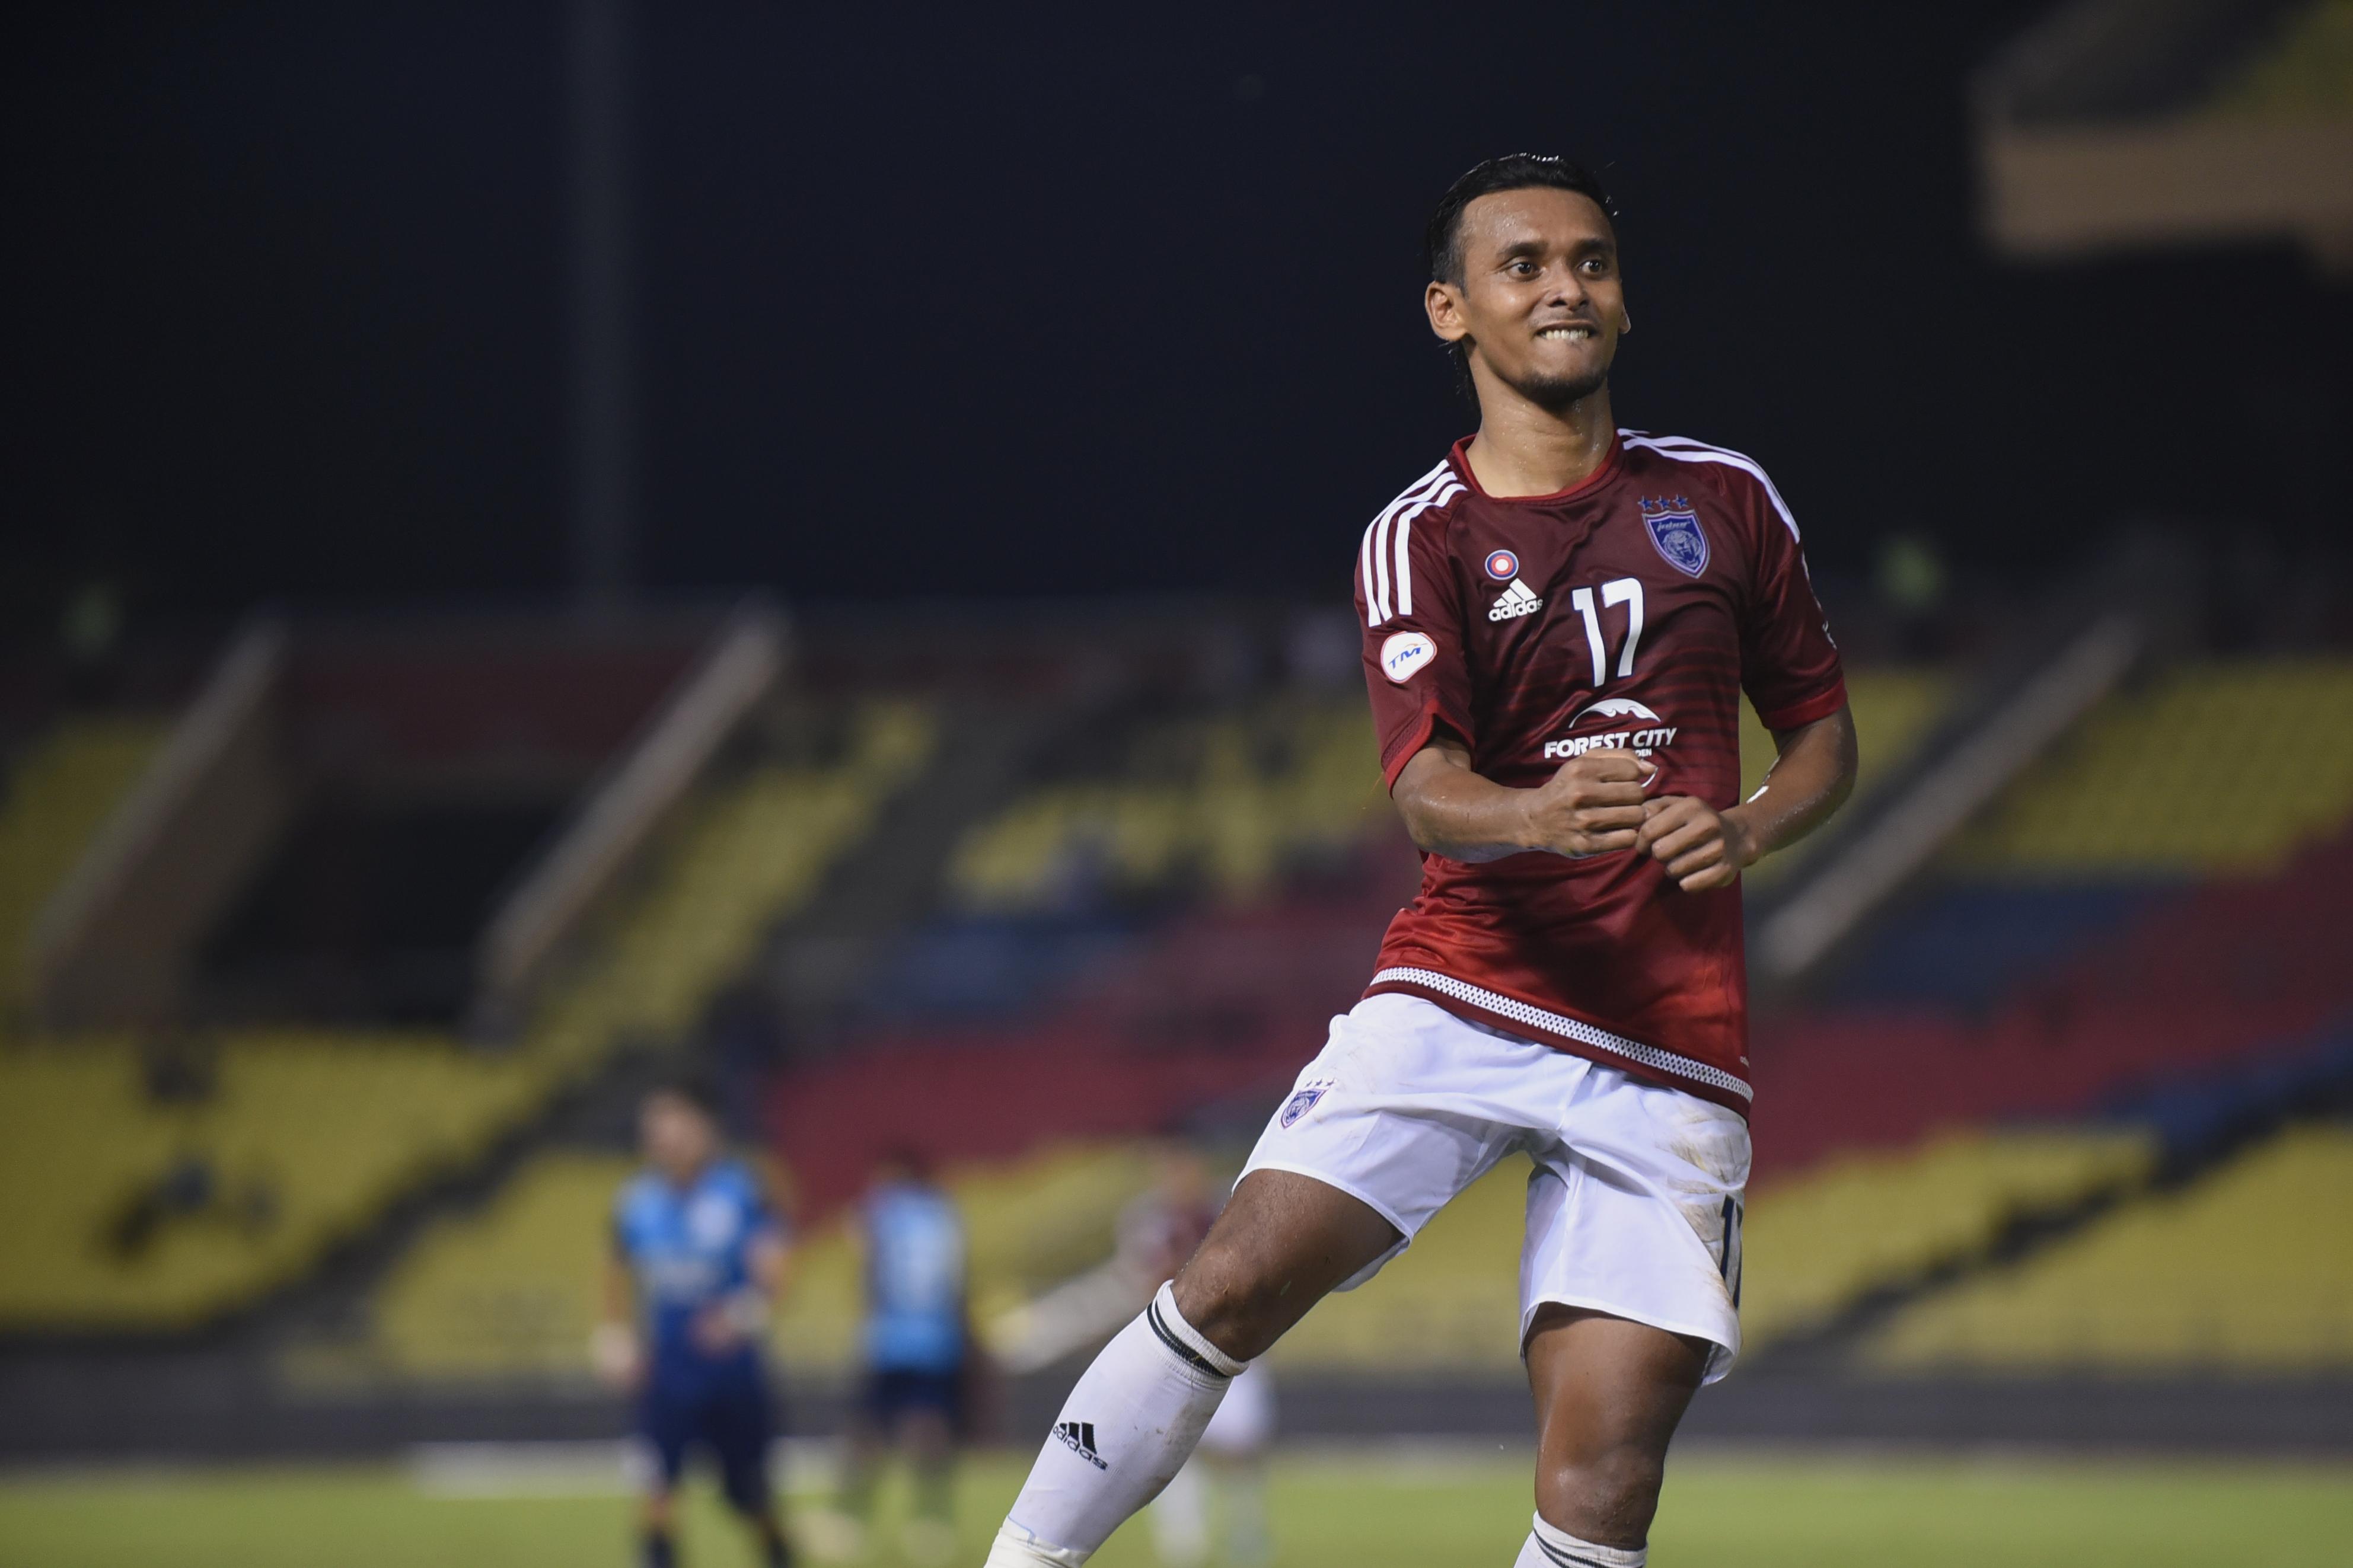 Johor Darul Ta'zim's Amri Yahyah celebrating his goal against PDRM 19/7/2016